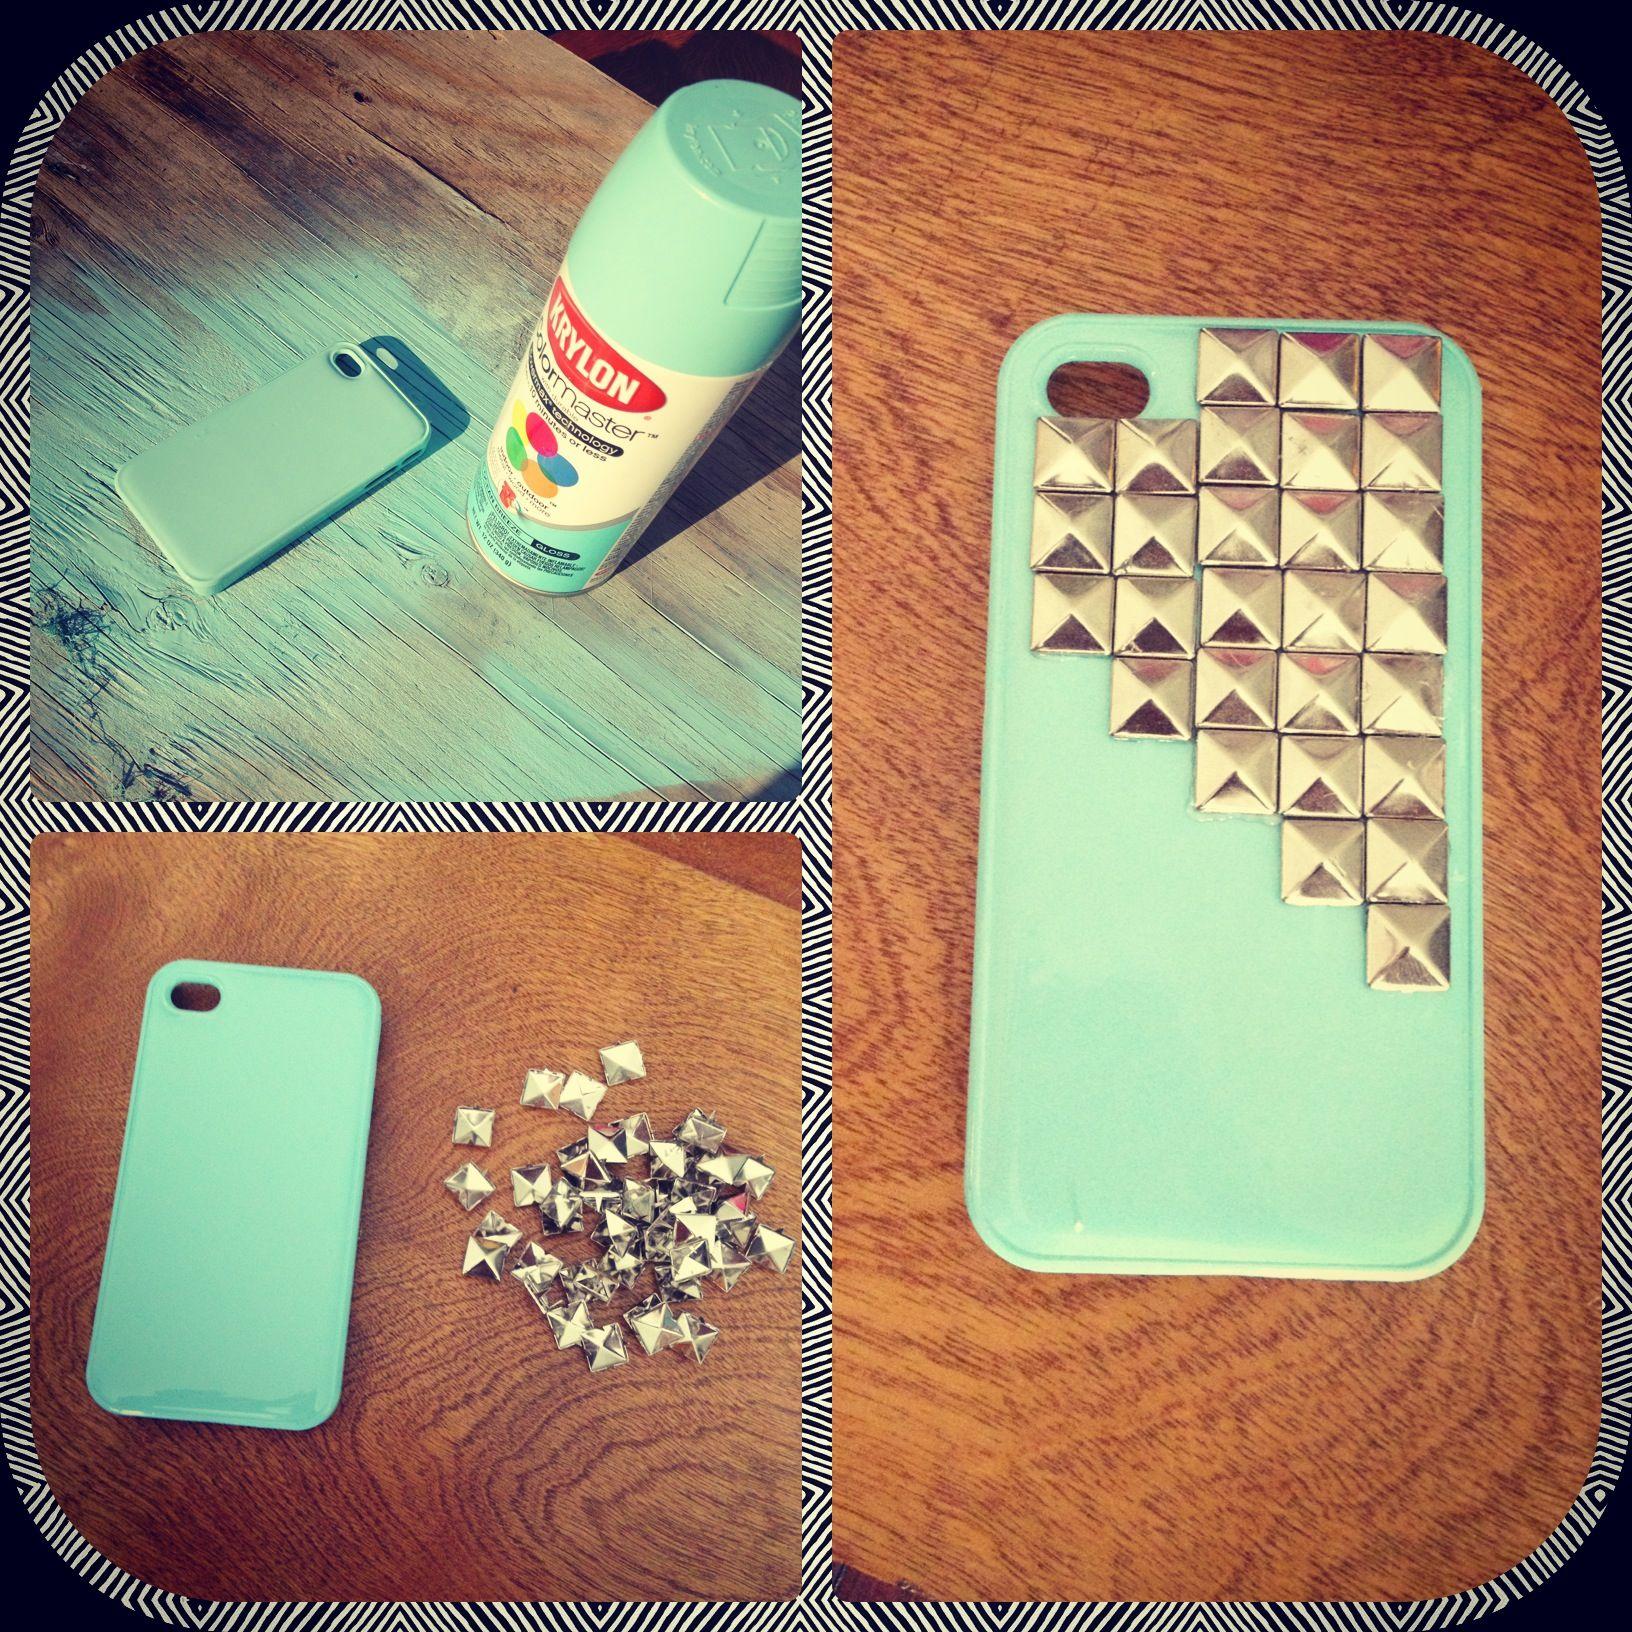 Diy phone case spray paint an old cheap phone case hot for Spray paint iphone case